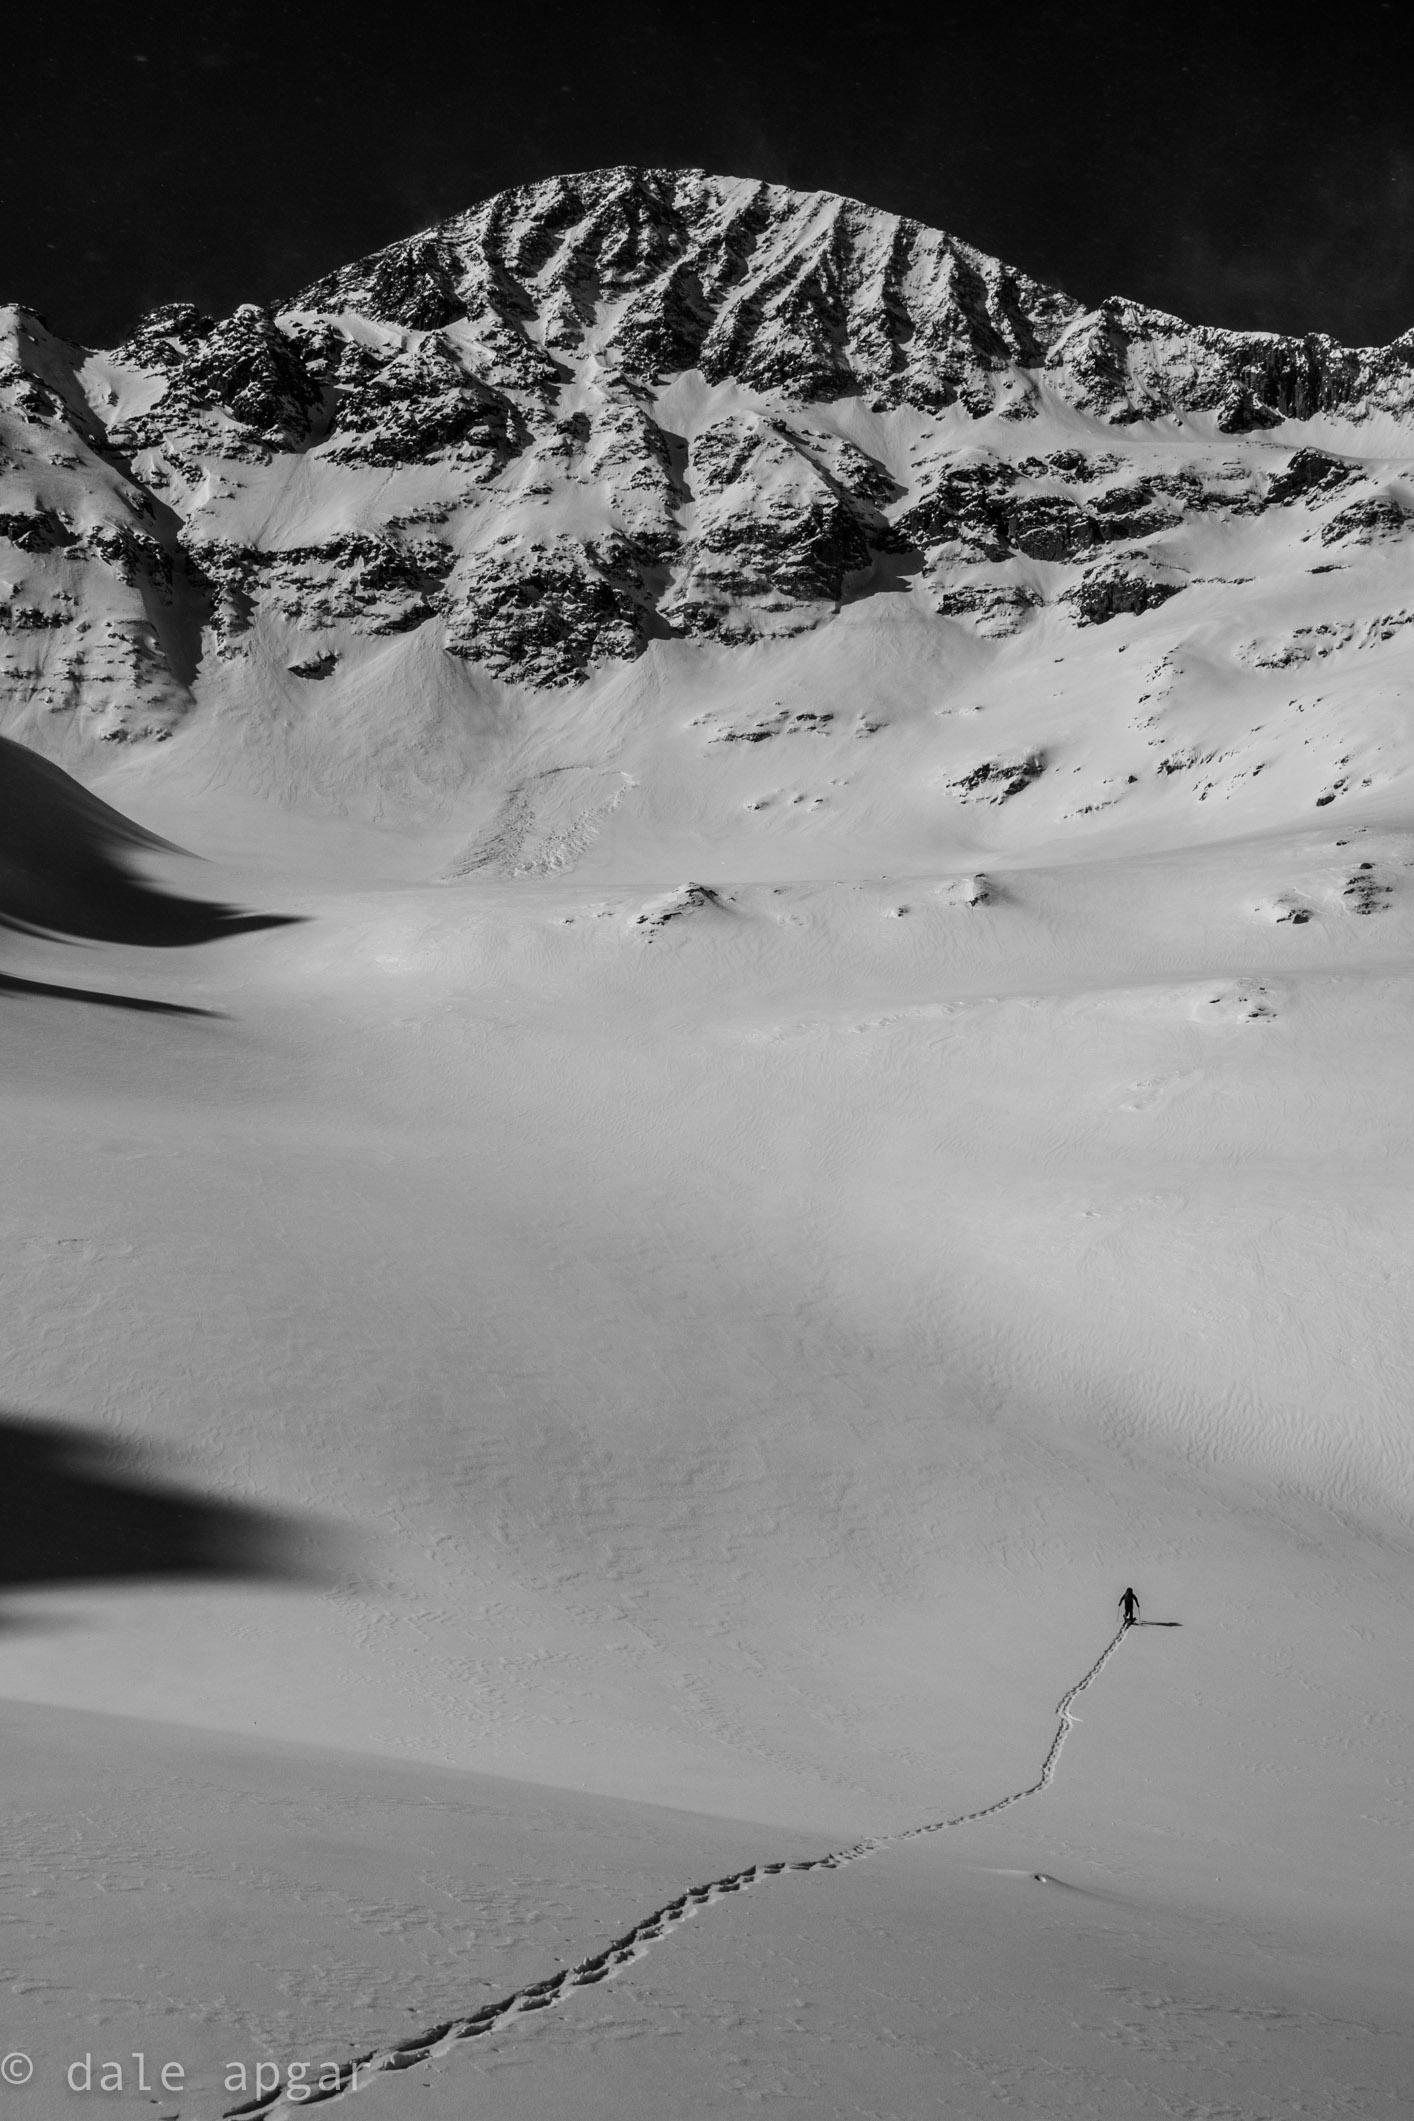 dale_apgar_ski-34.jpg